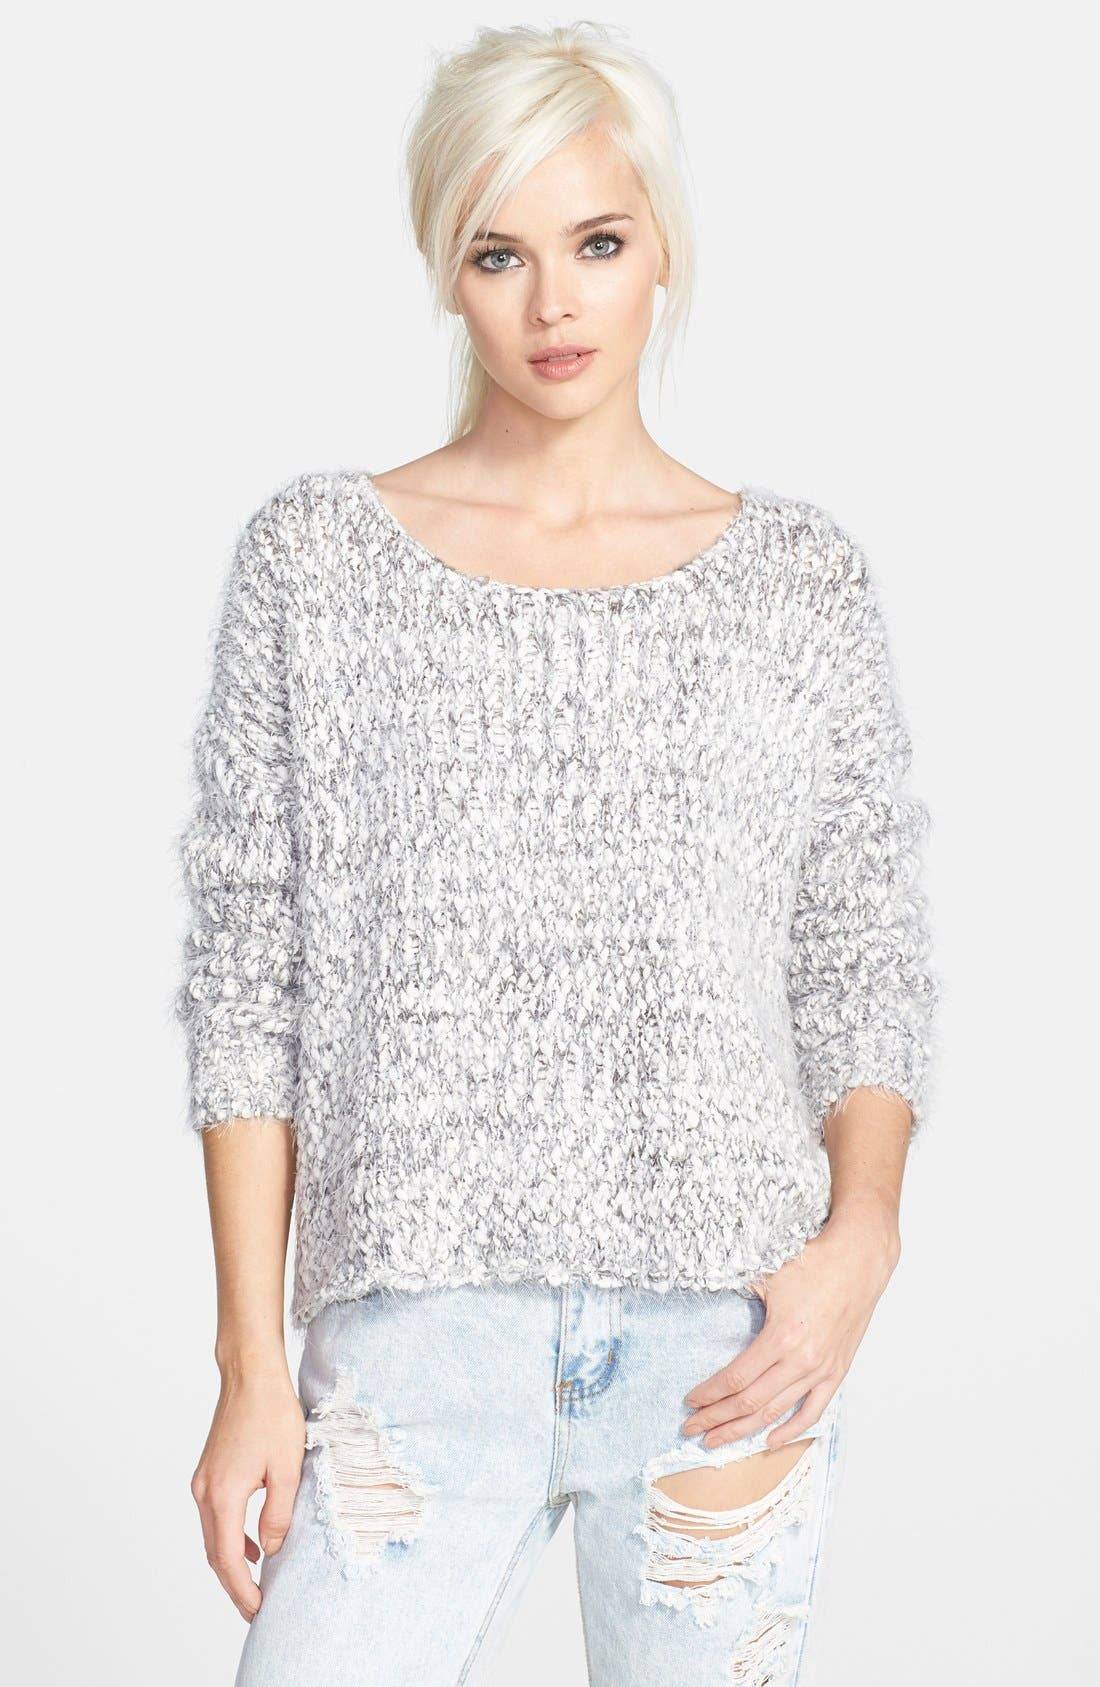 Alternate Image 1 Selected - ASTR Marled Fringe Sweater